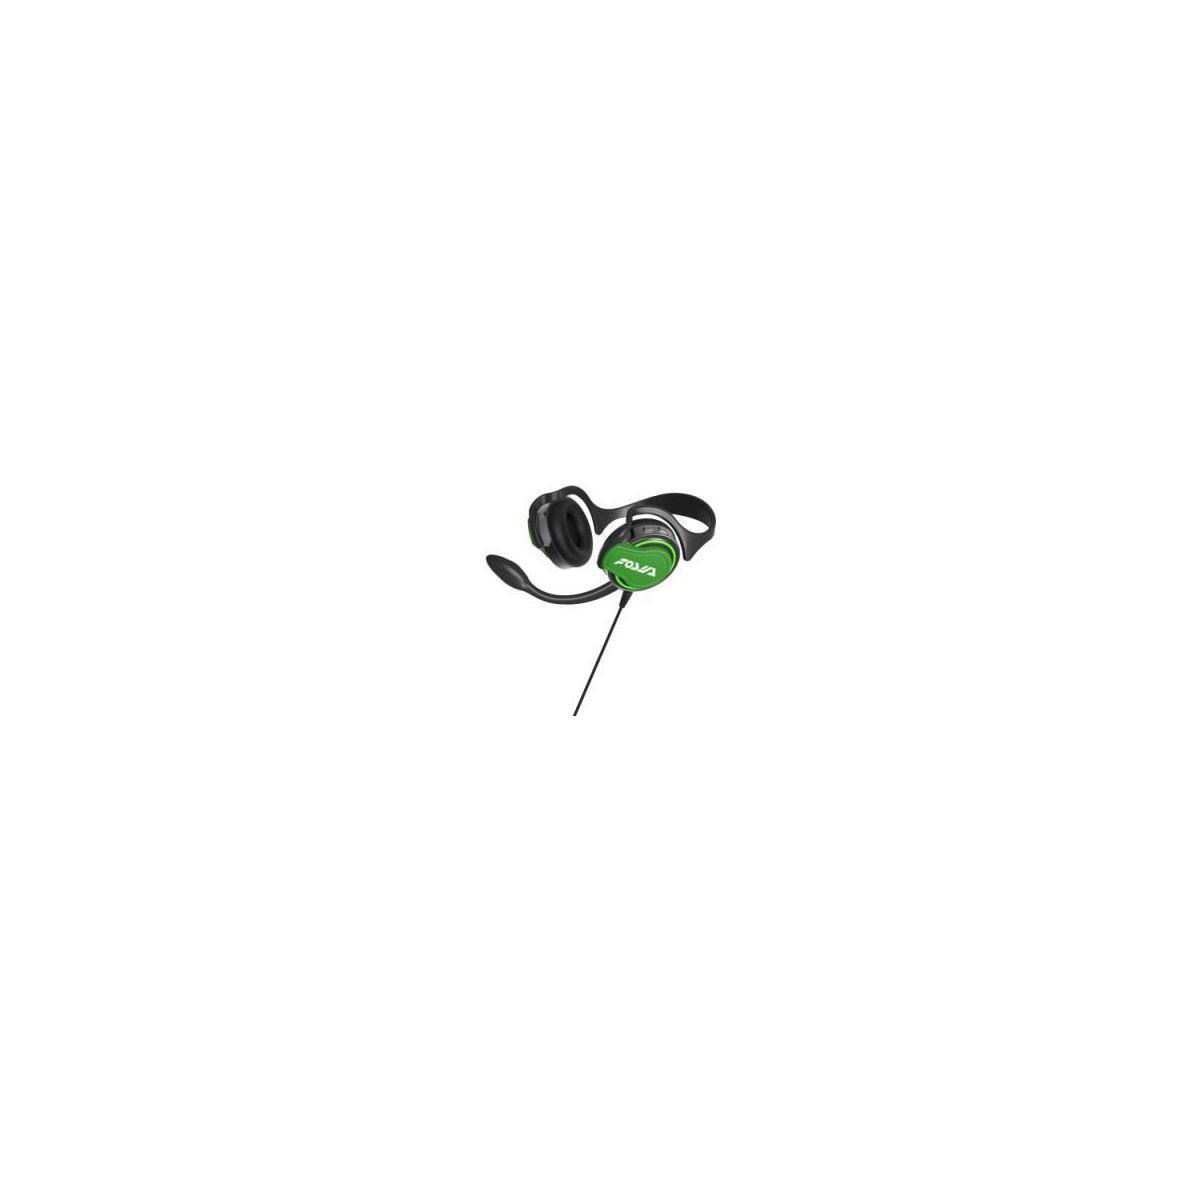 Acc. hori casque gaming splatoon 2 - 10% de remise immédiate avec le code : cool10 (photo)